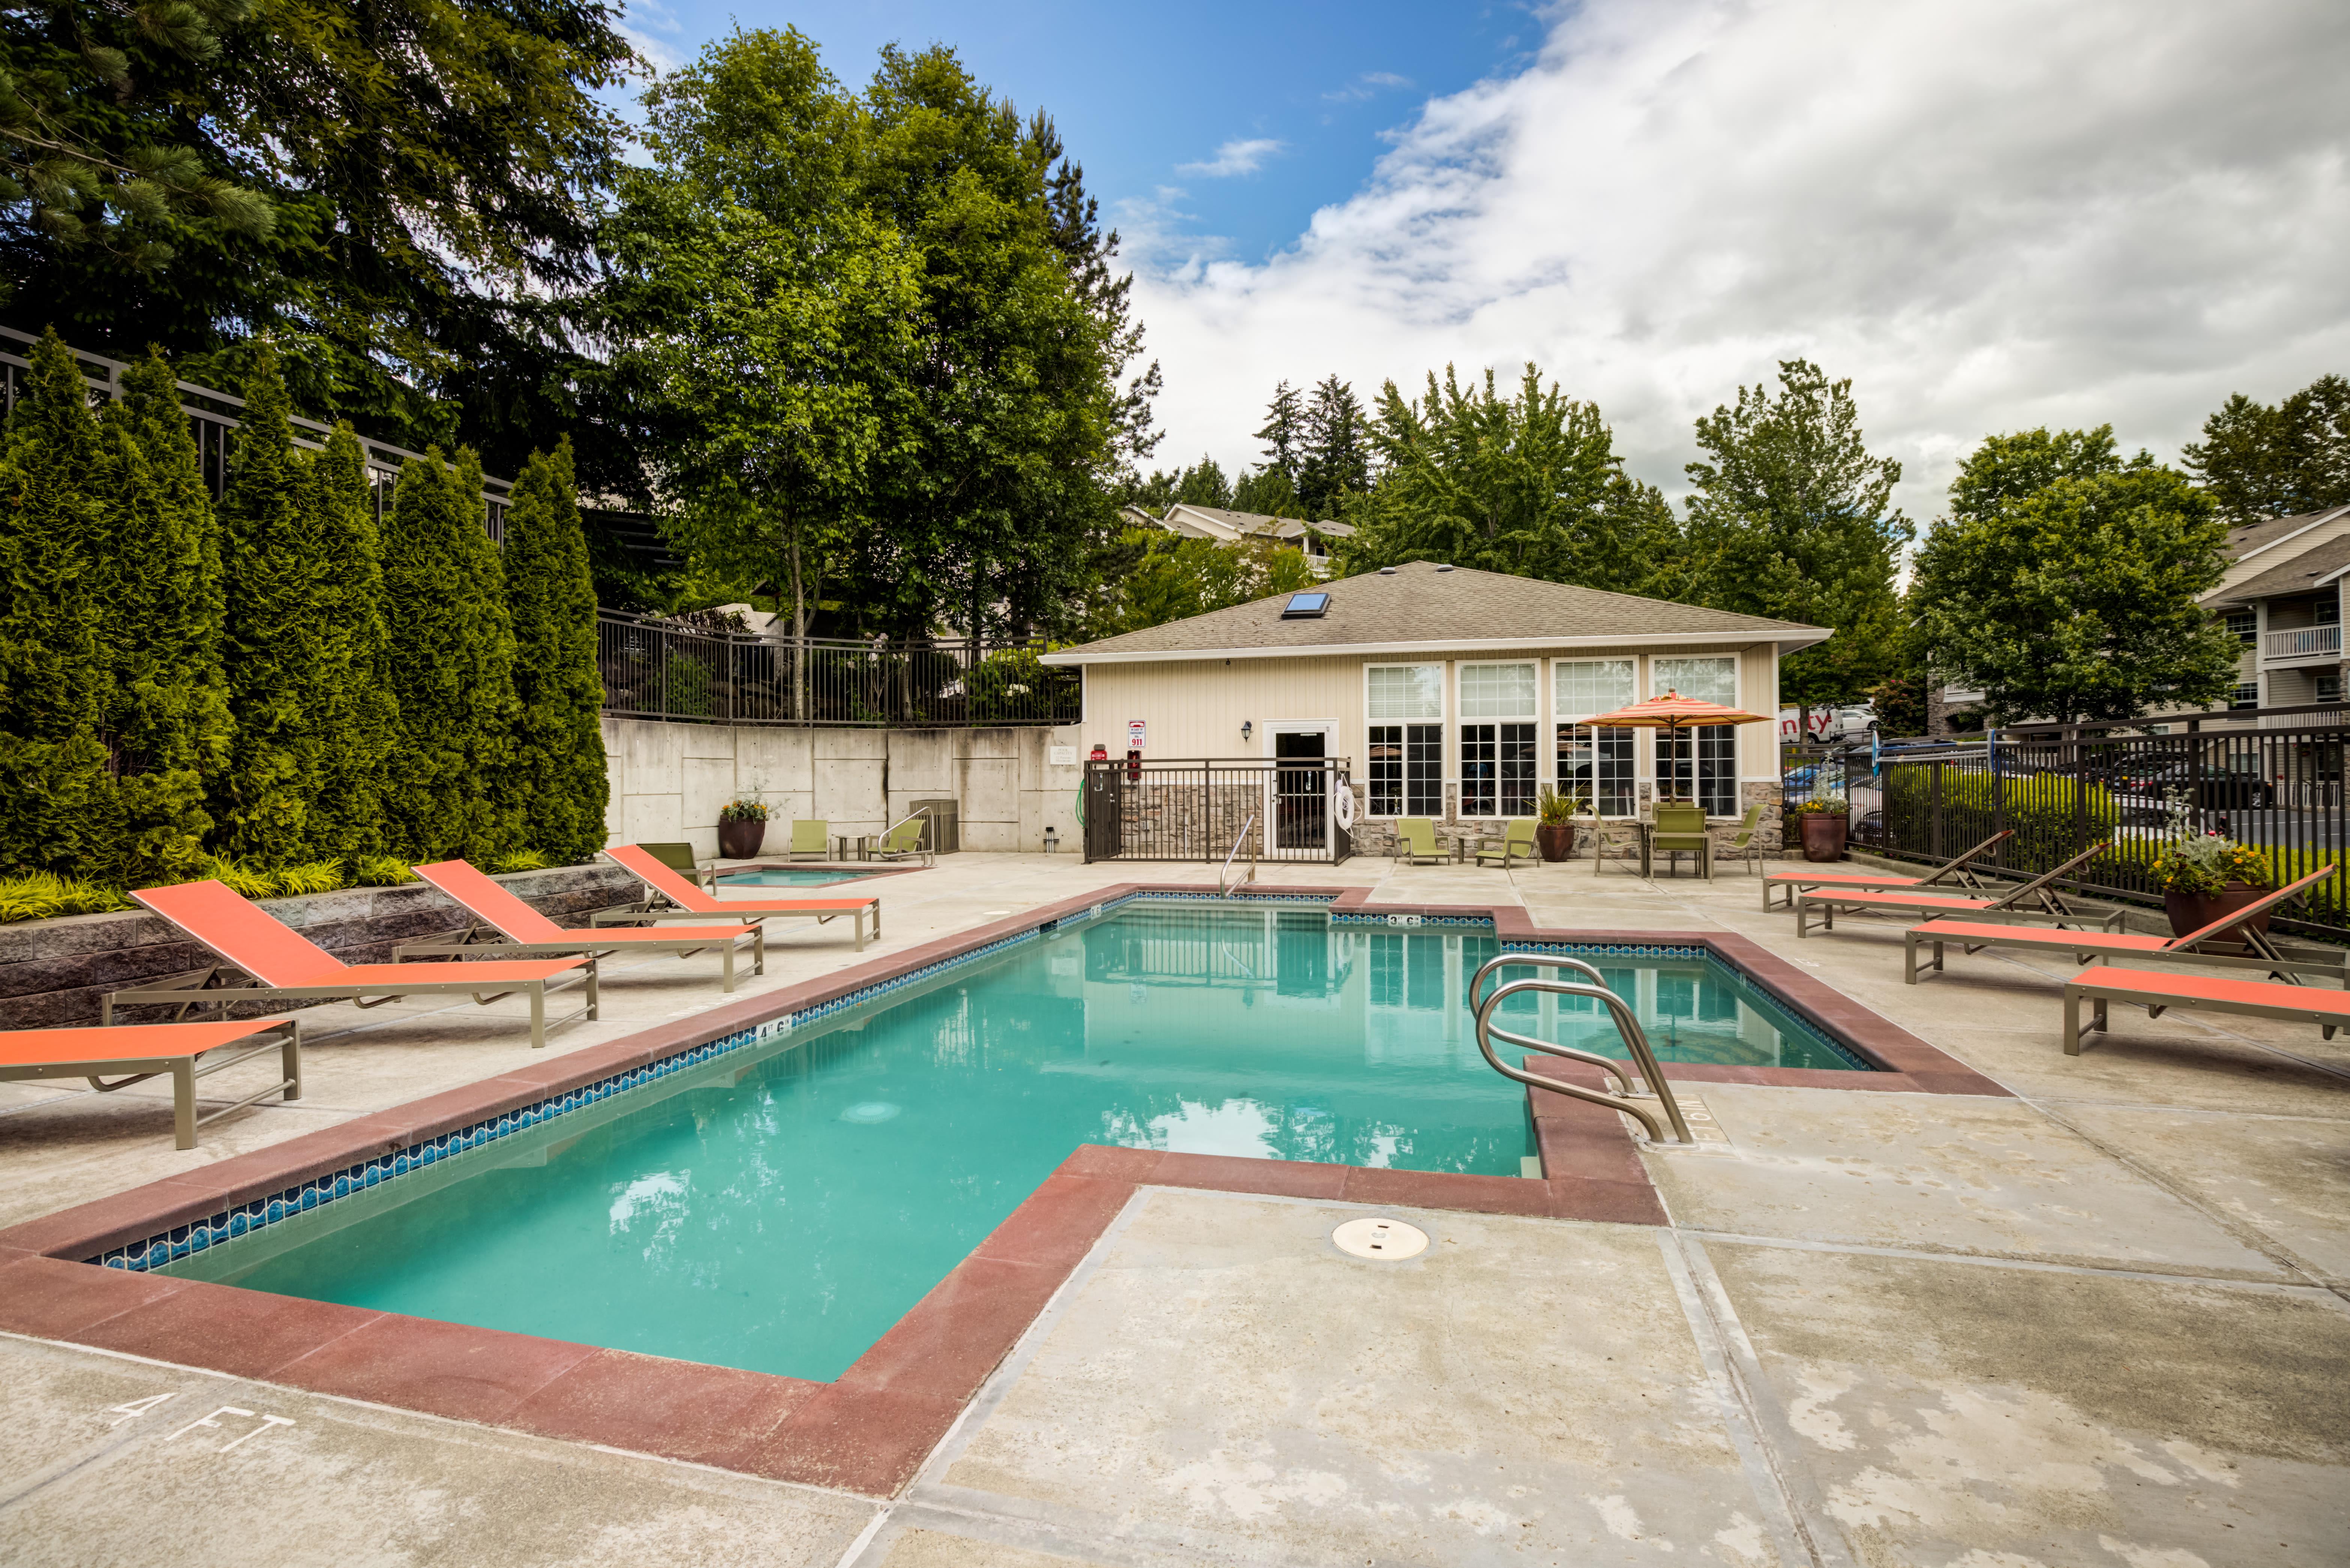 Swimming Pool at The Knolls at Inglewood Hill in Sammamish, Washington